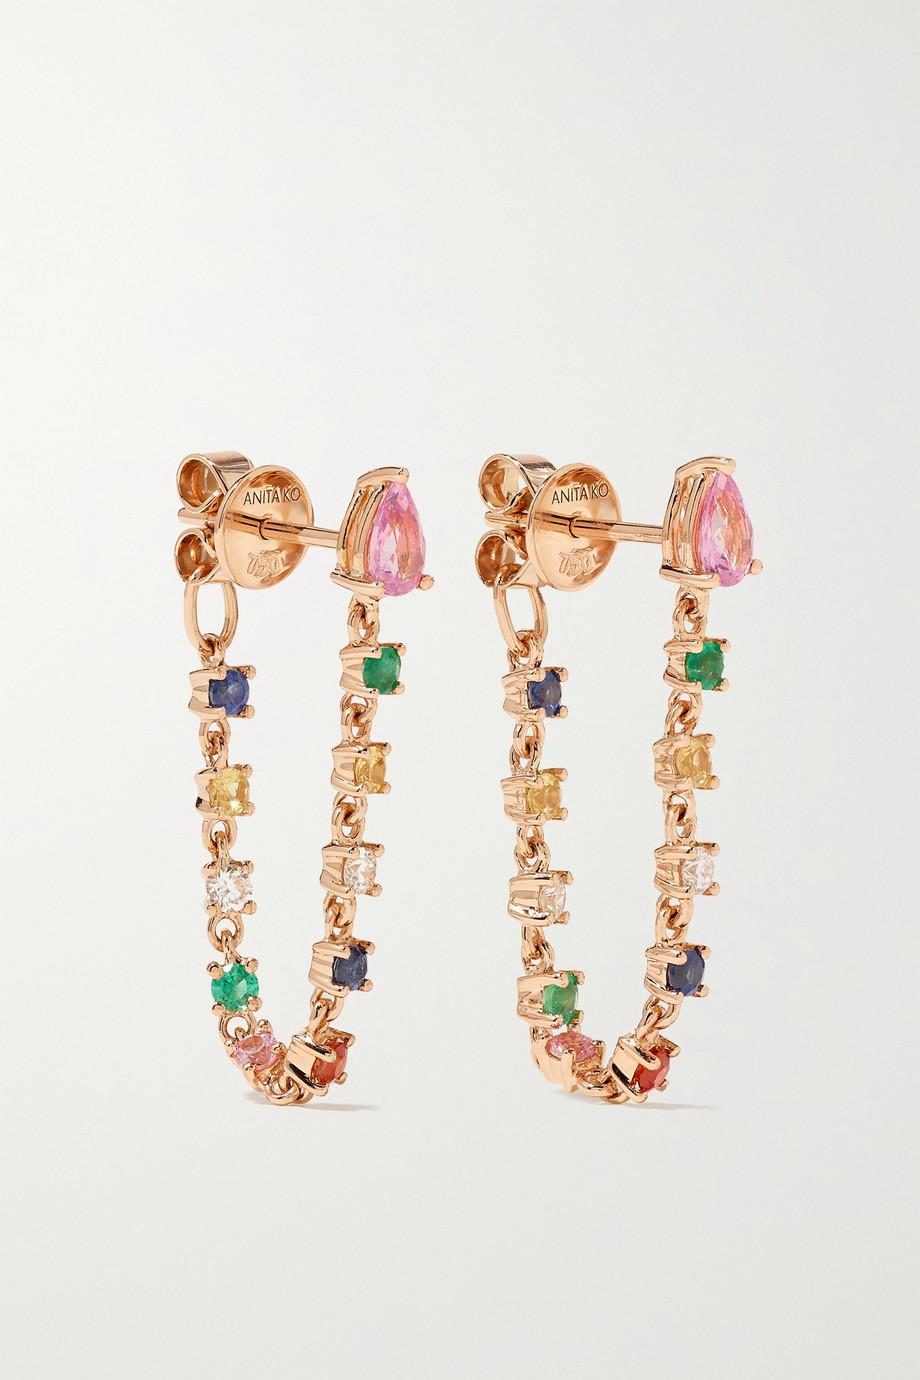 Anita Ko Boucles d'oreilles en or rose 18 carats (750/1000), saphirs et diamants